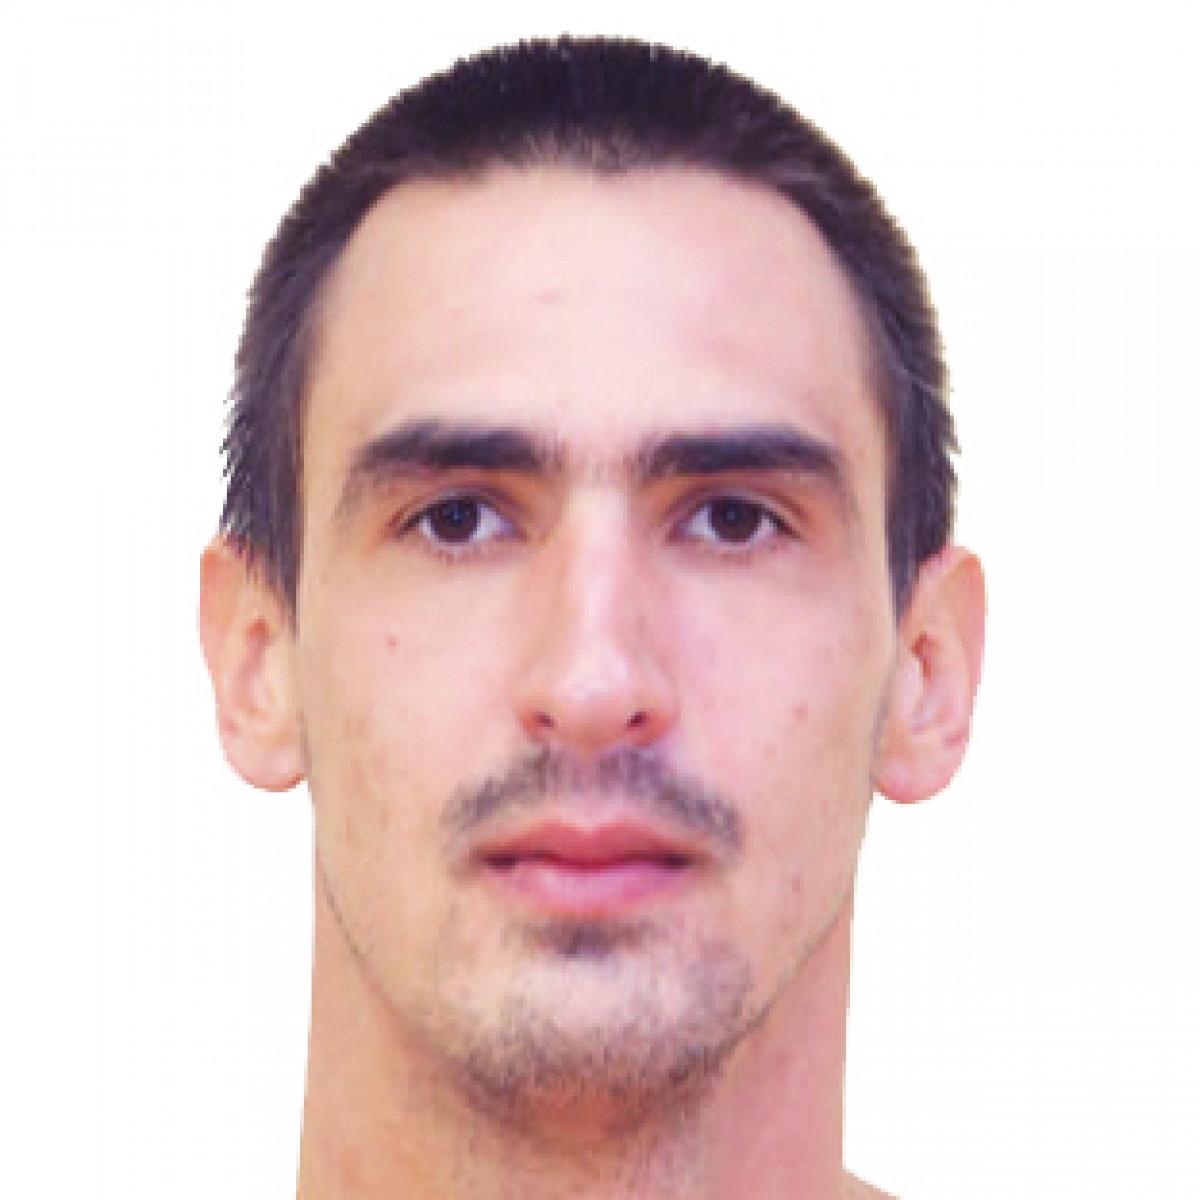 Radenko Smolovic